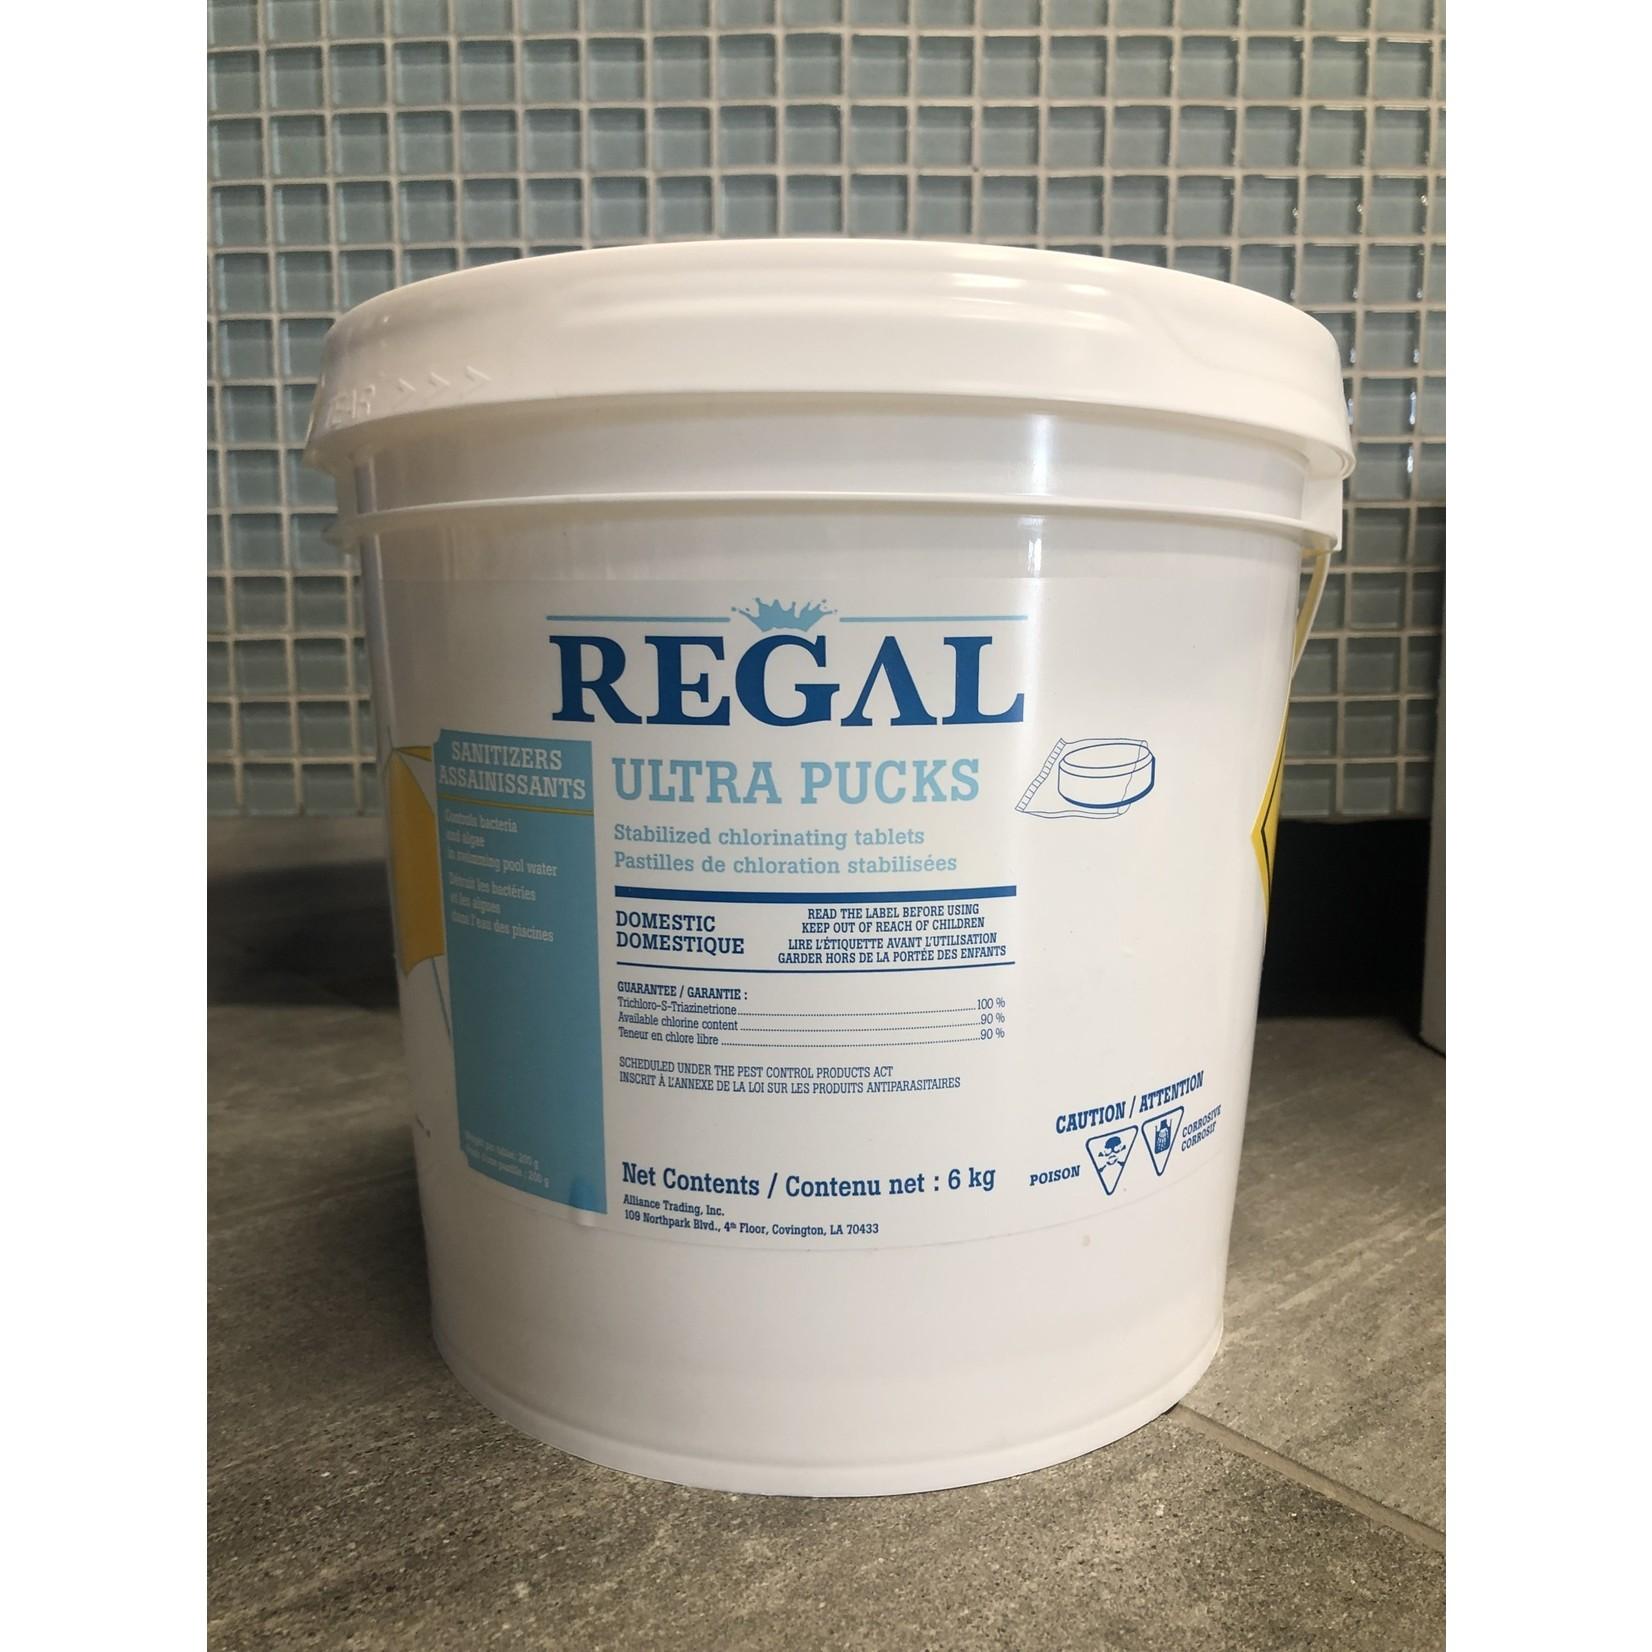 REGAL ULTRA PUCKS 6KG